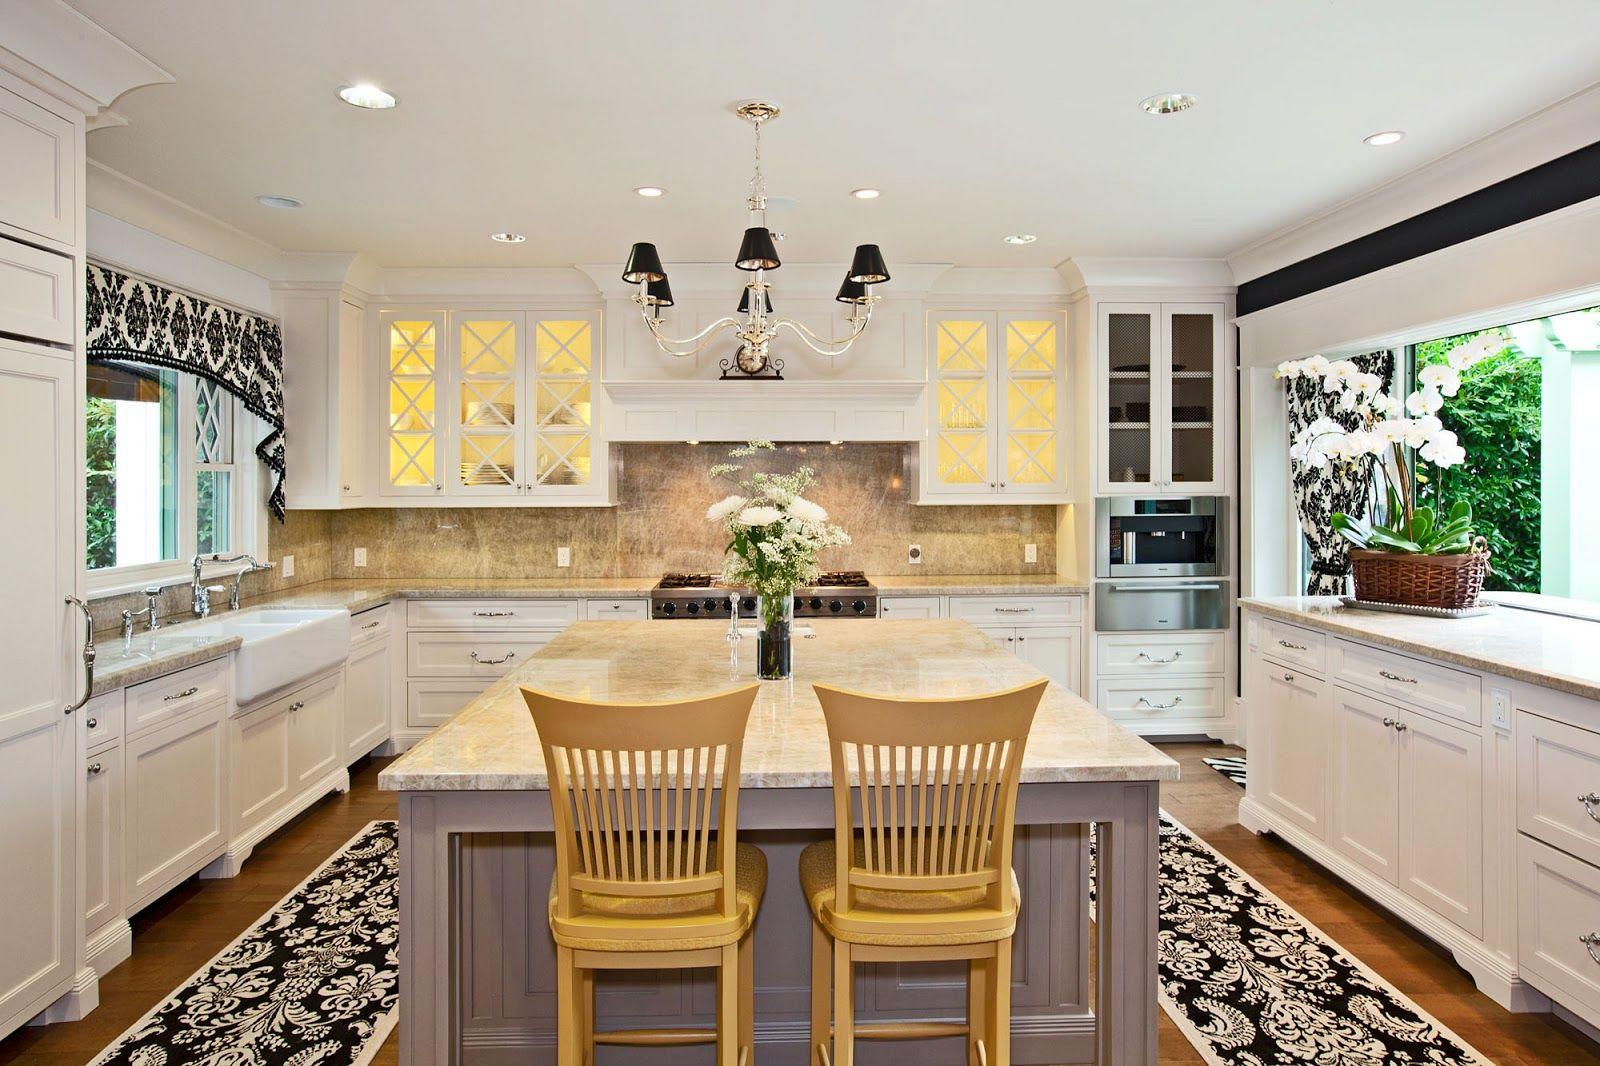 New Home Interior Design Stunning Decor Interior Design Kitchen Kitchen Inspirations Home Kitchens